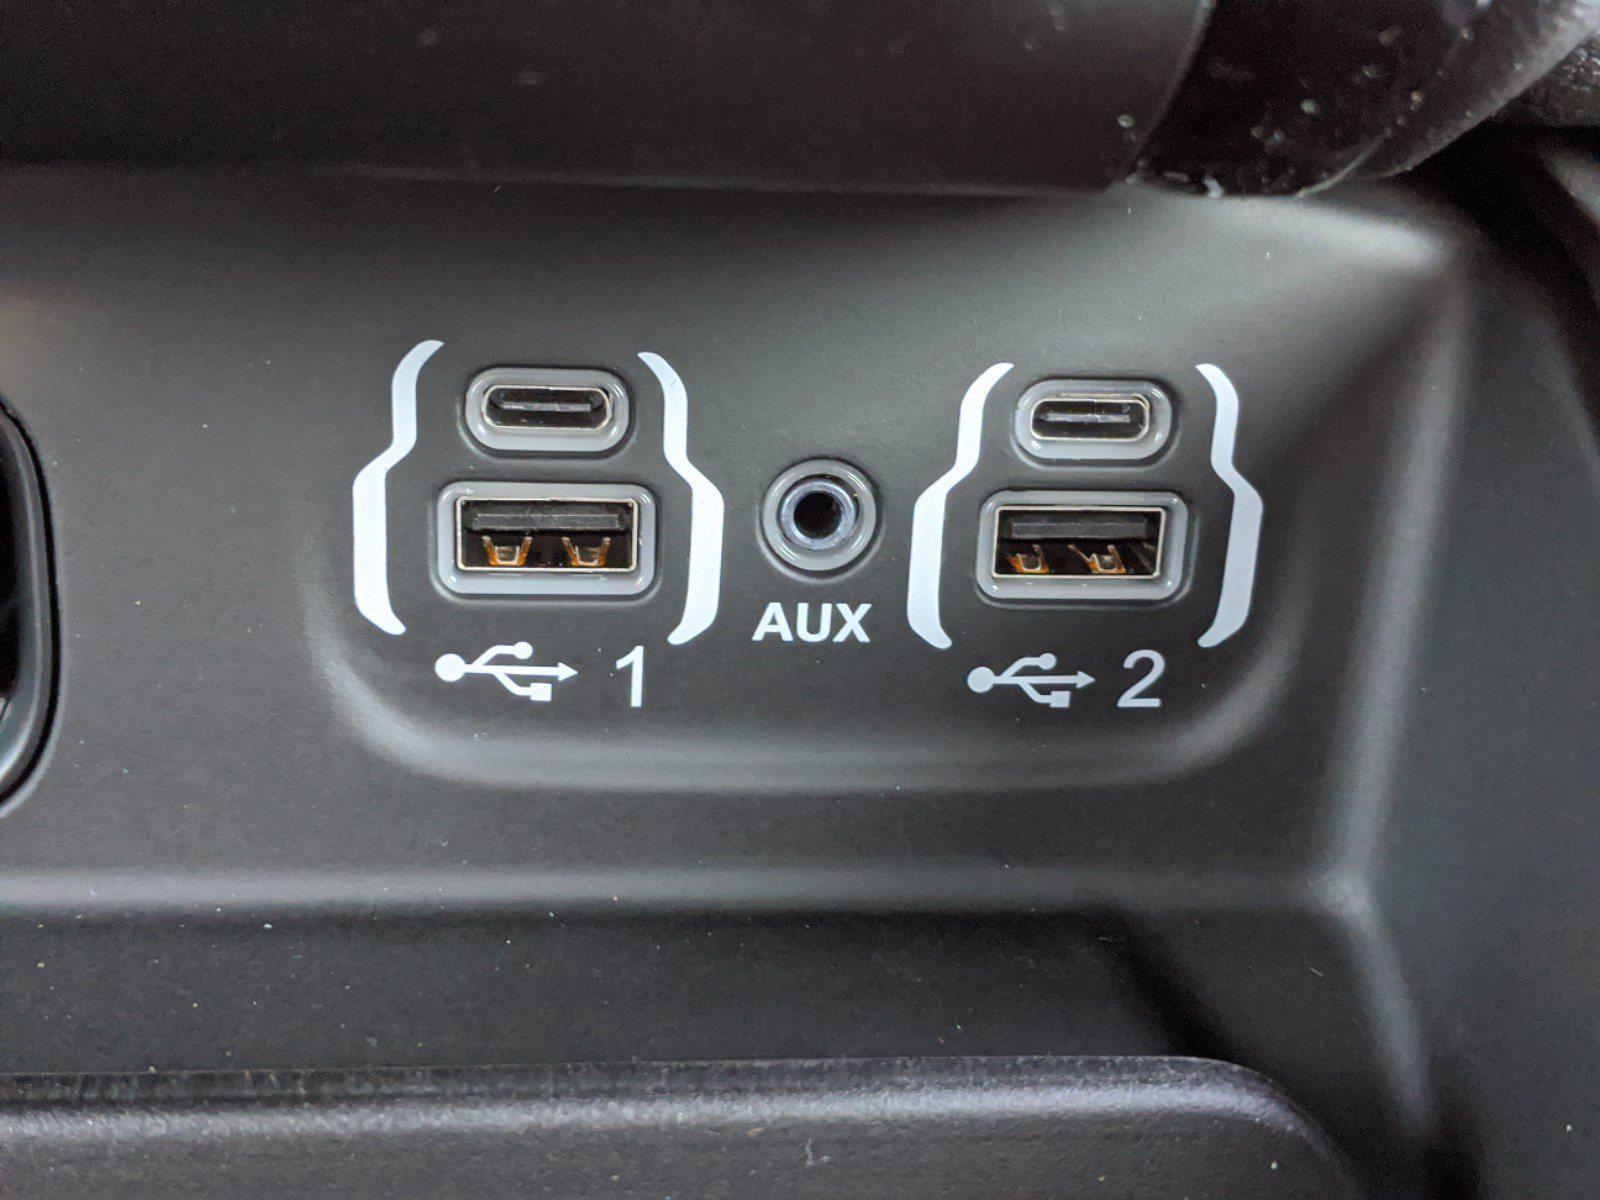 2021 Ram 1500 Quad Cab 4x2, Pickup #R21322 - photo 1